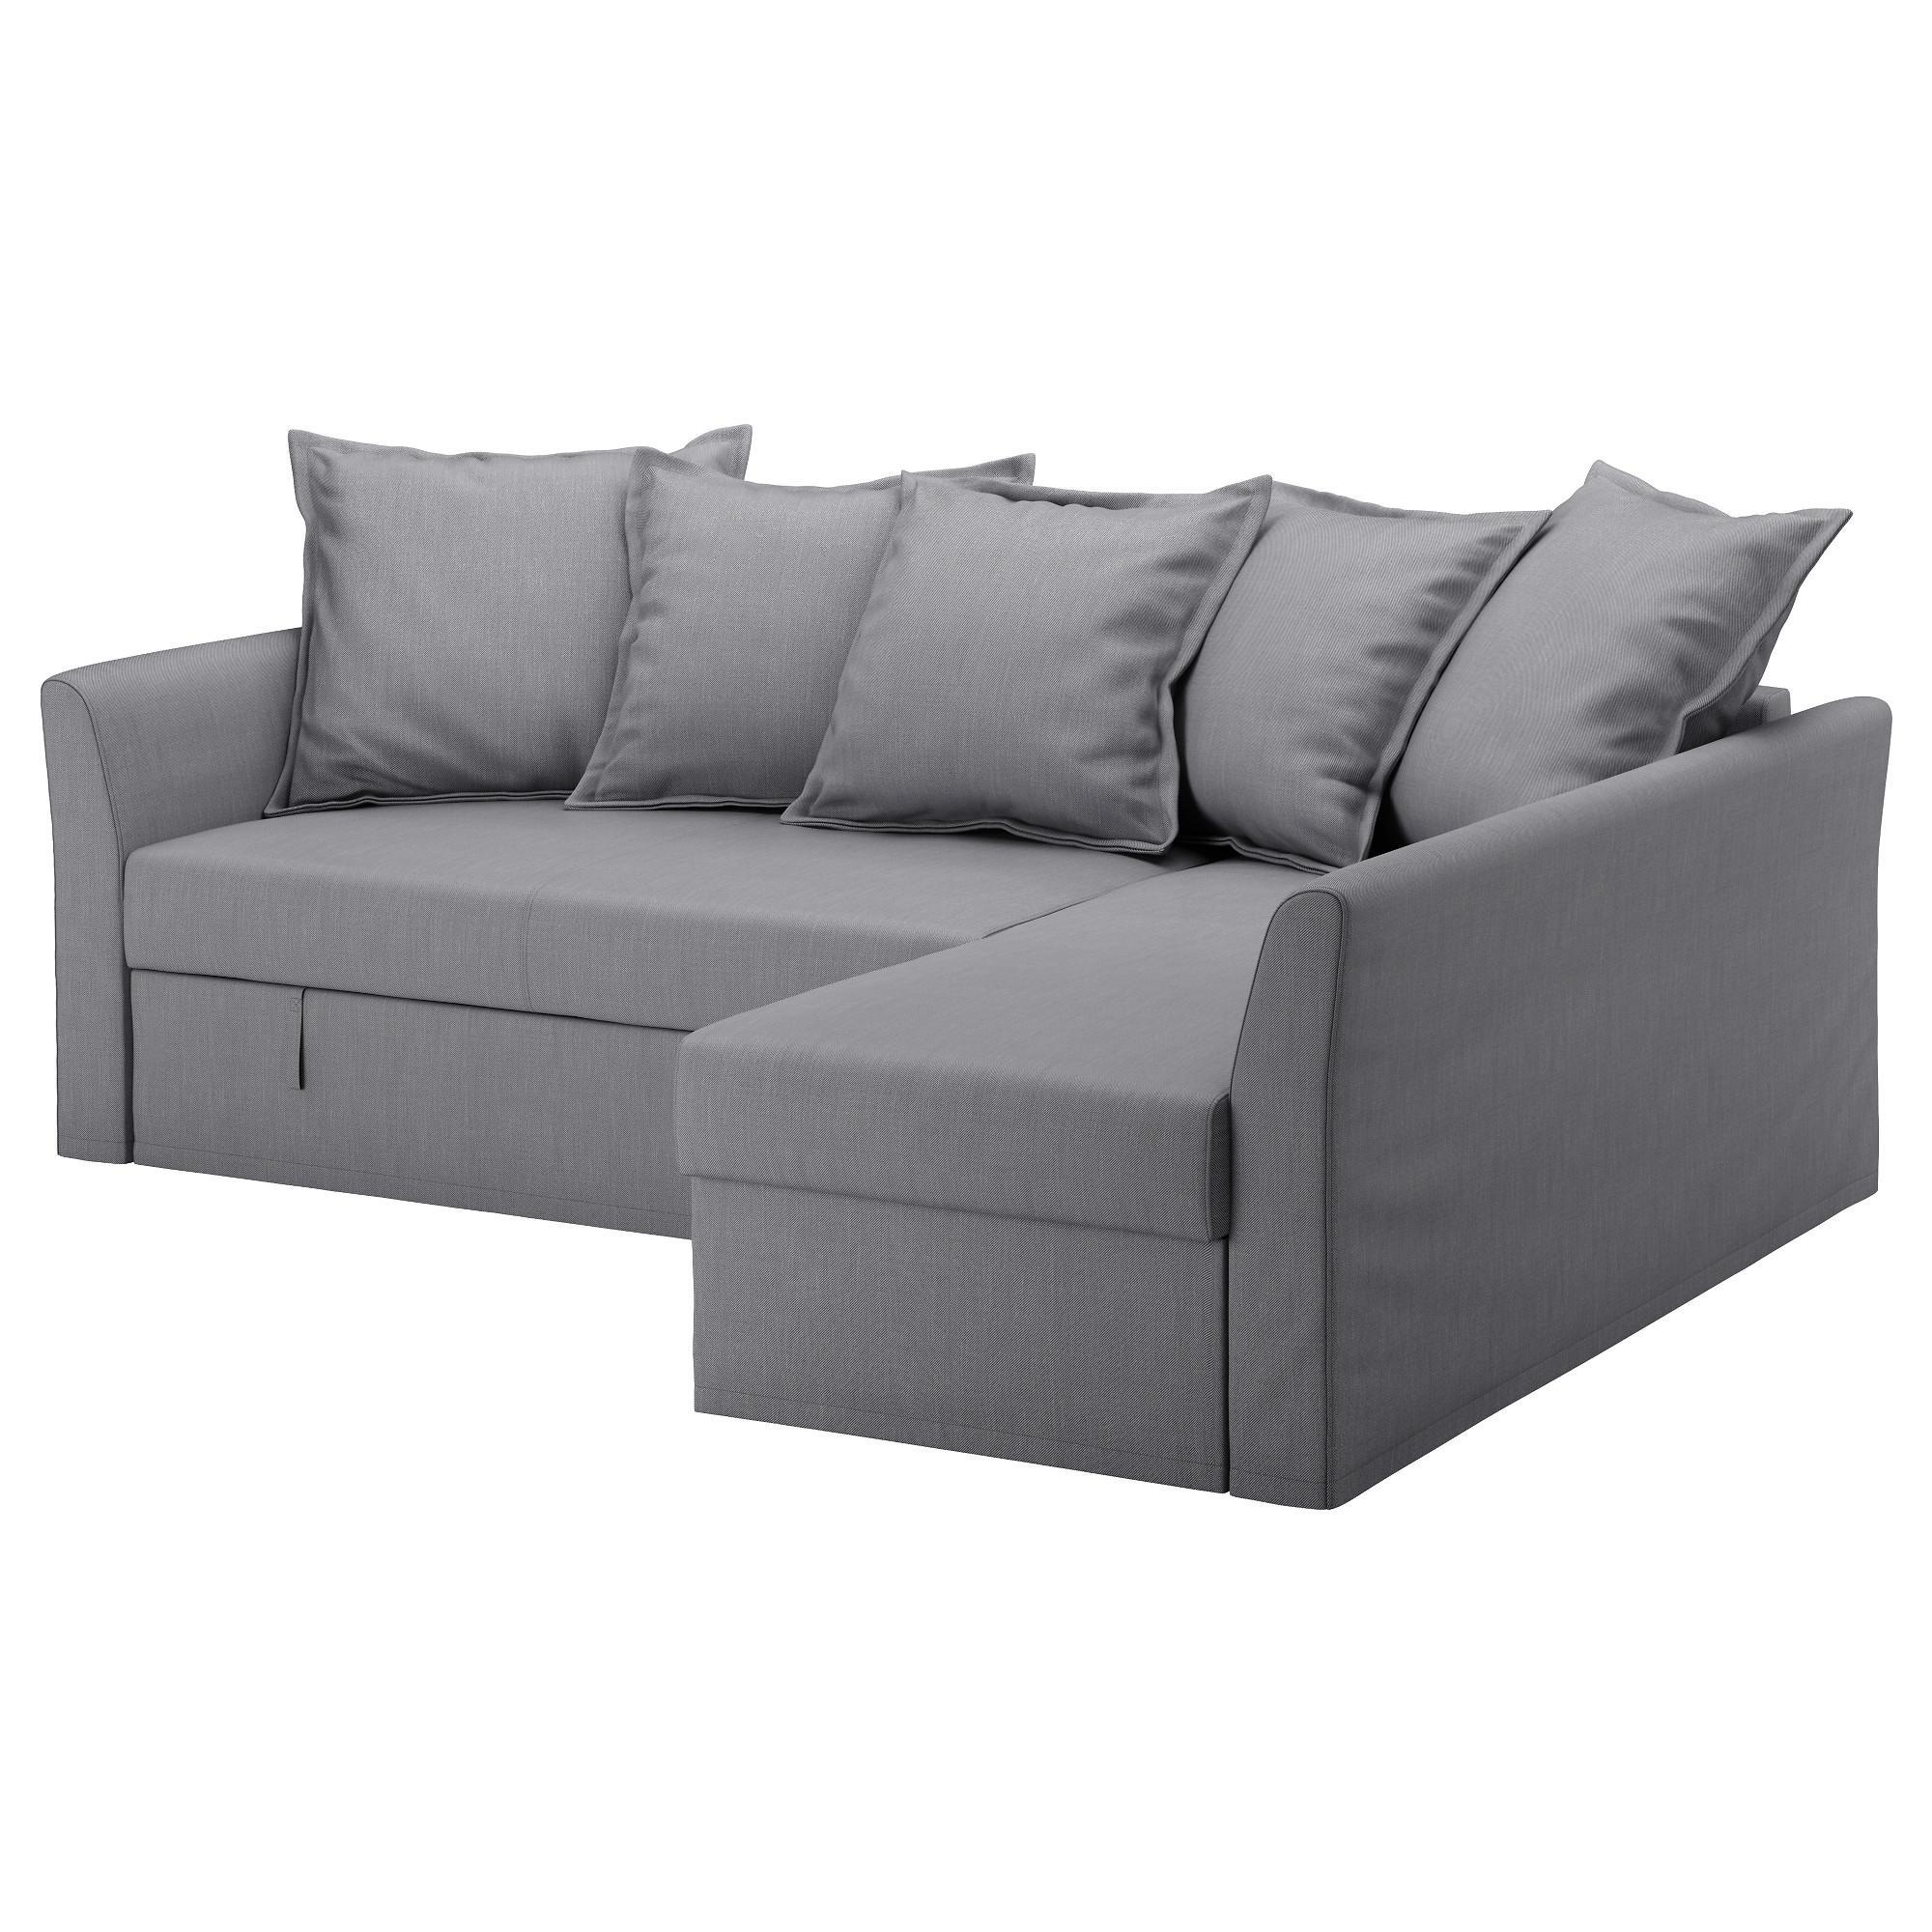 sofa sleeper cover score sepsis interpretation 20 collection of ikea sectional ideas